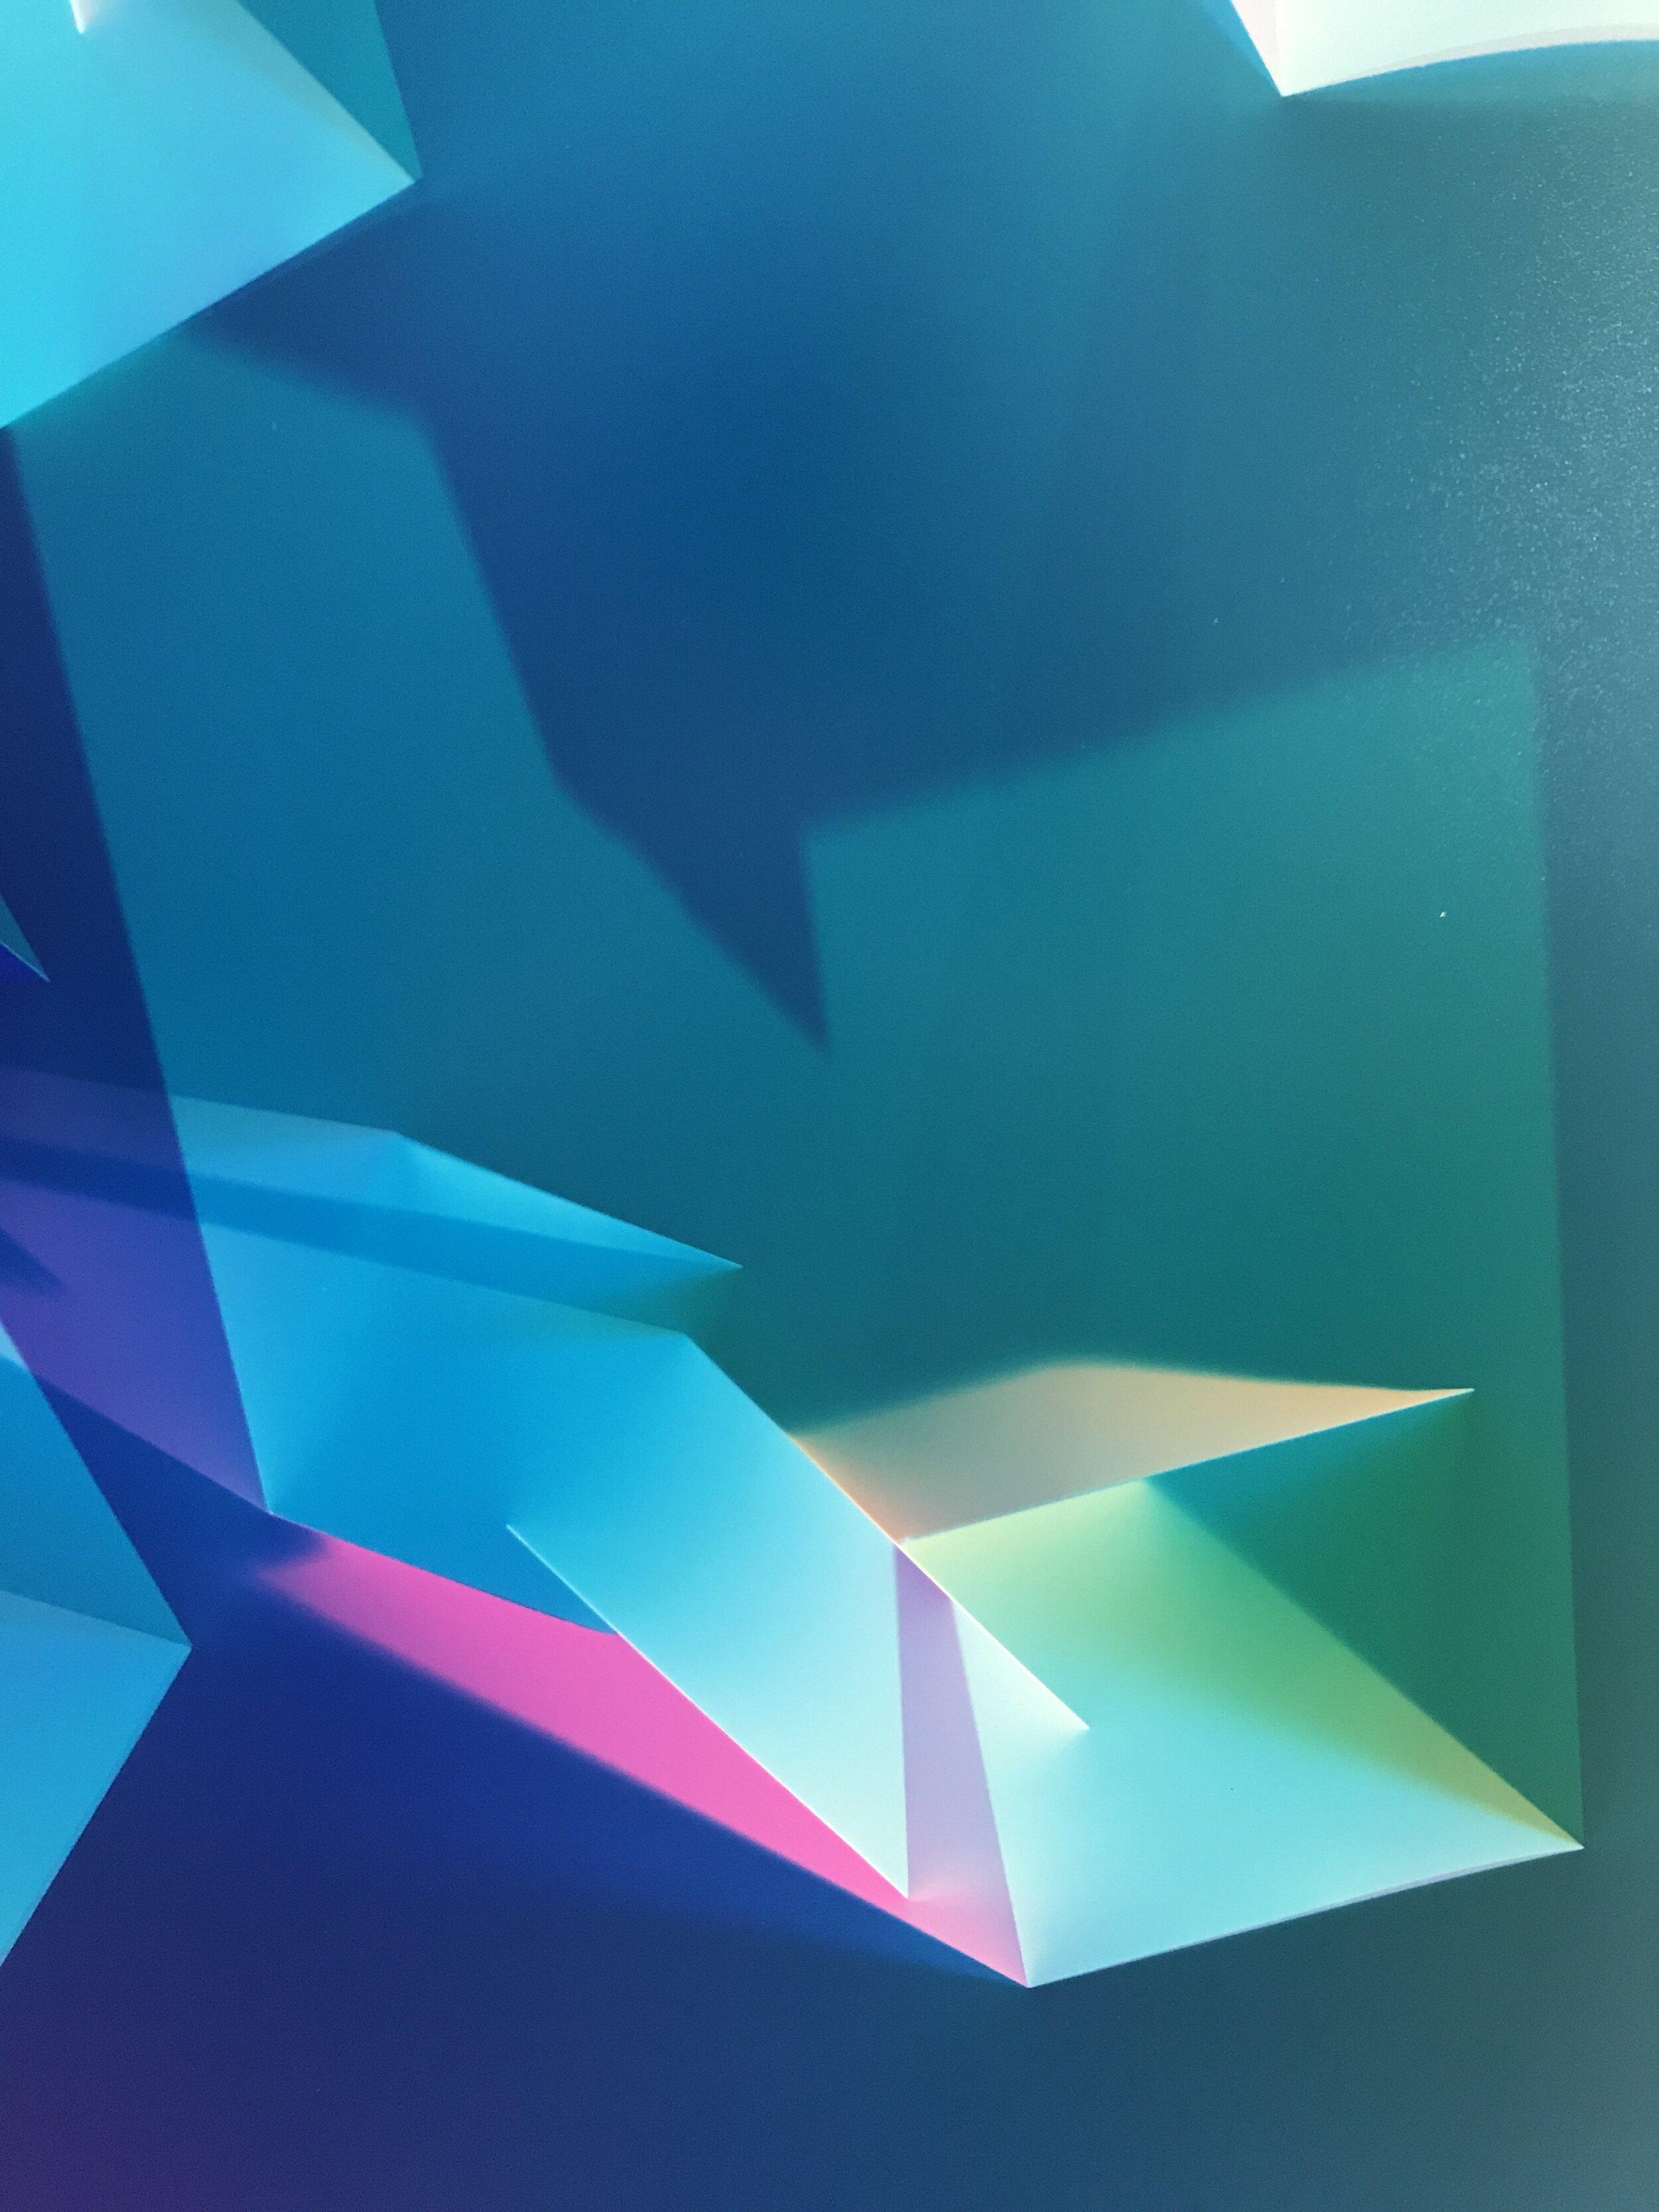 Natalja Kent Group Study Movement Artifacts Unusual Colors 1